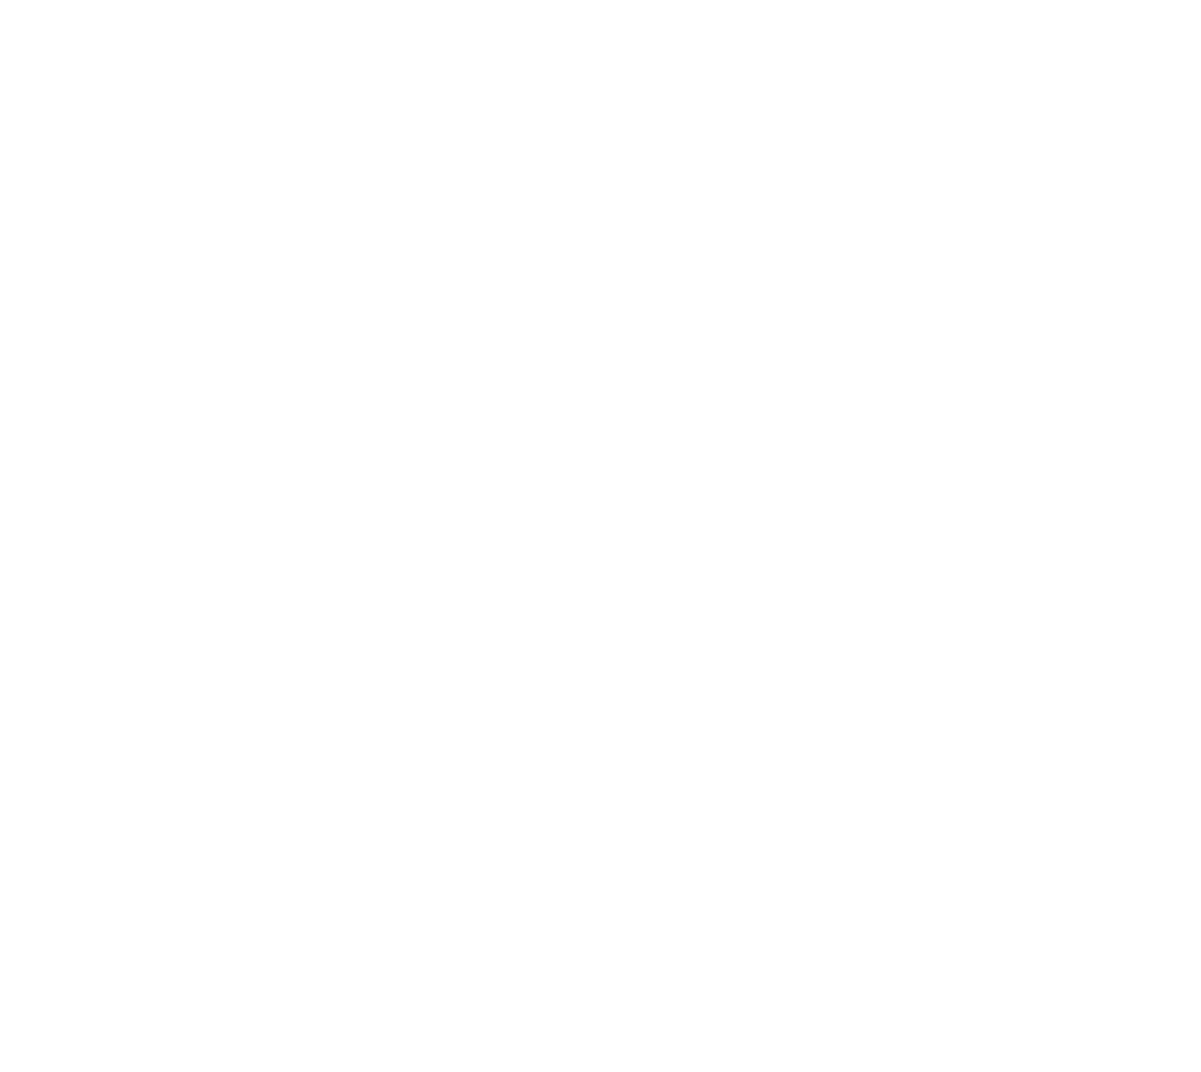 White_Interoperability-1